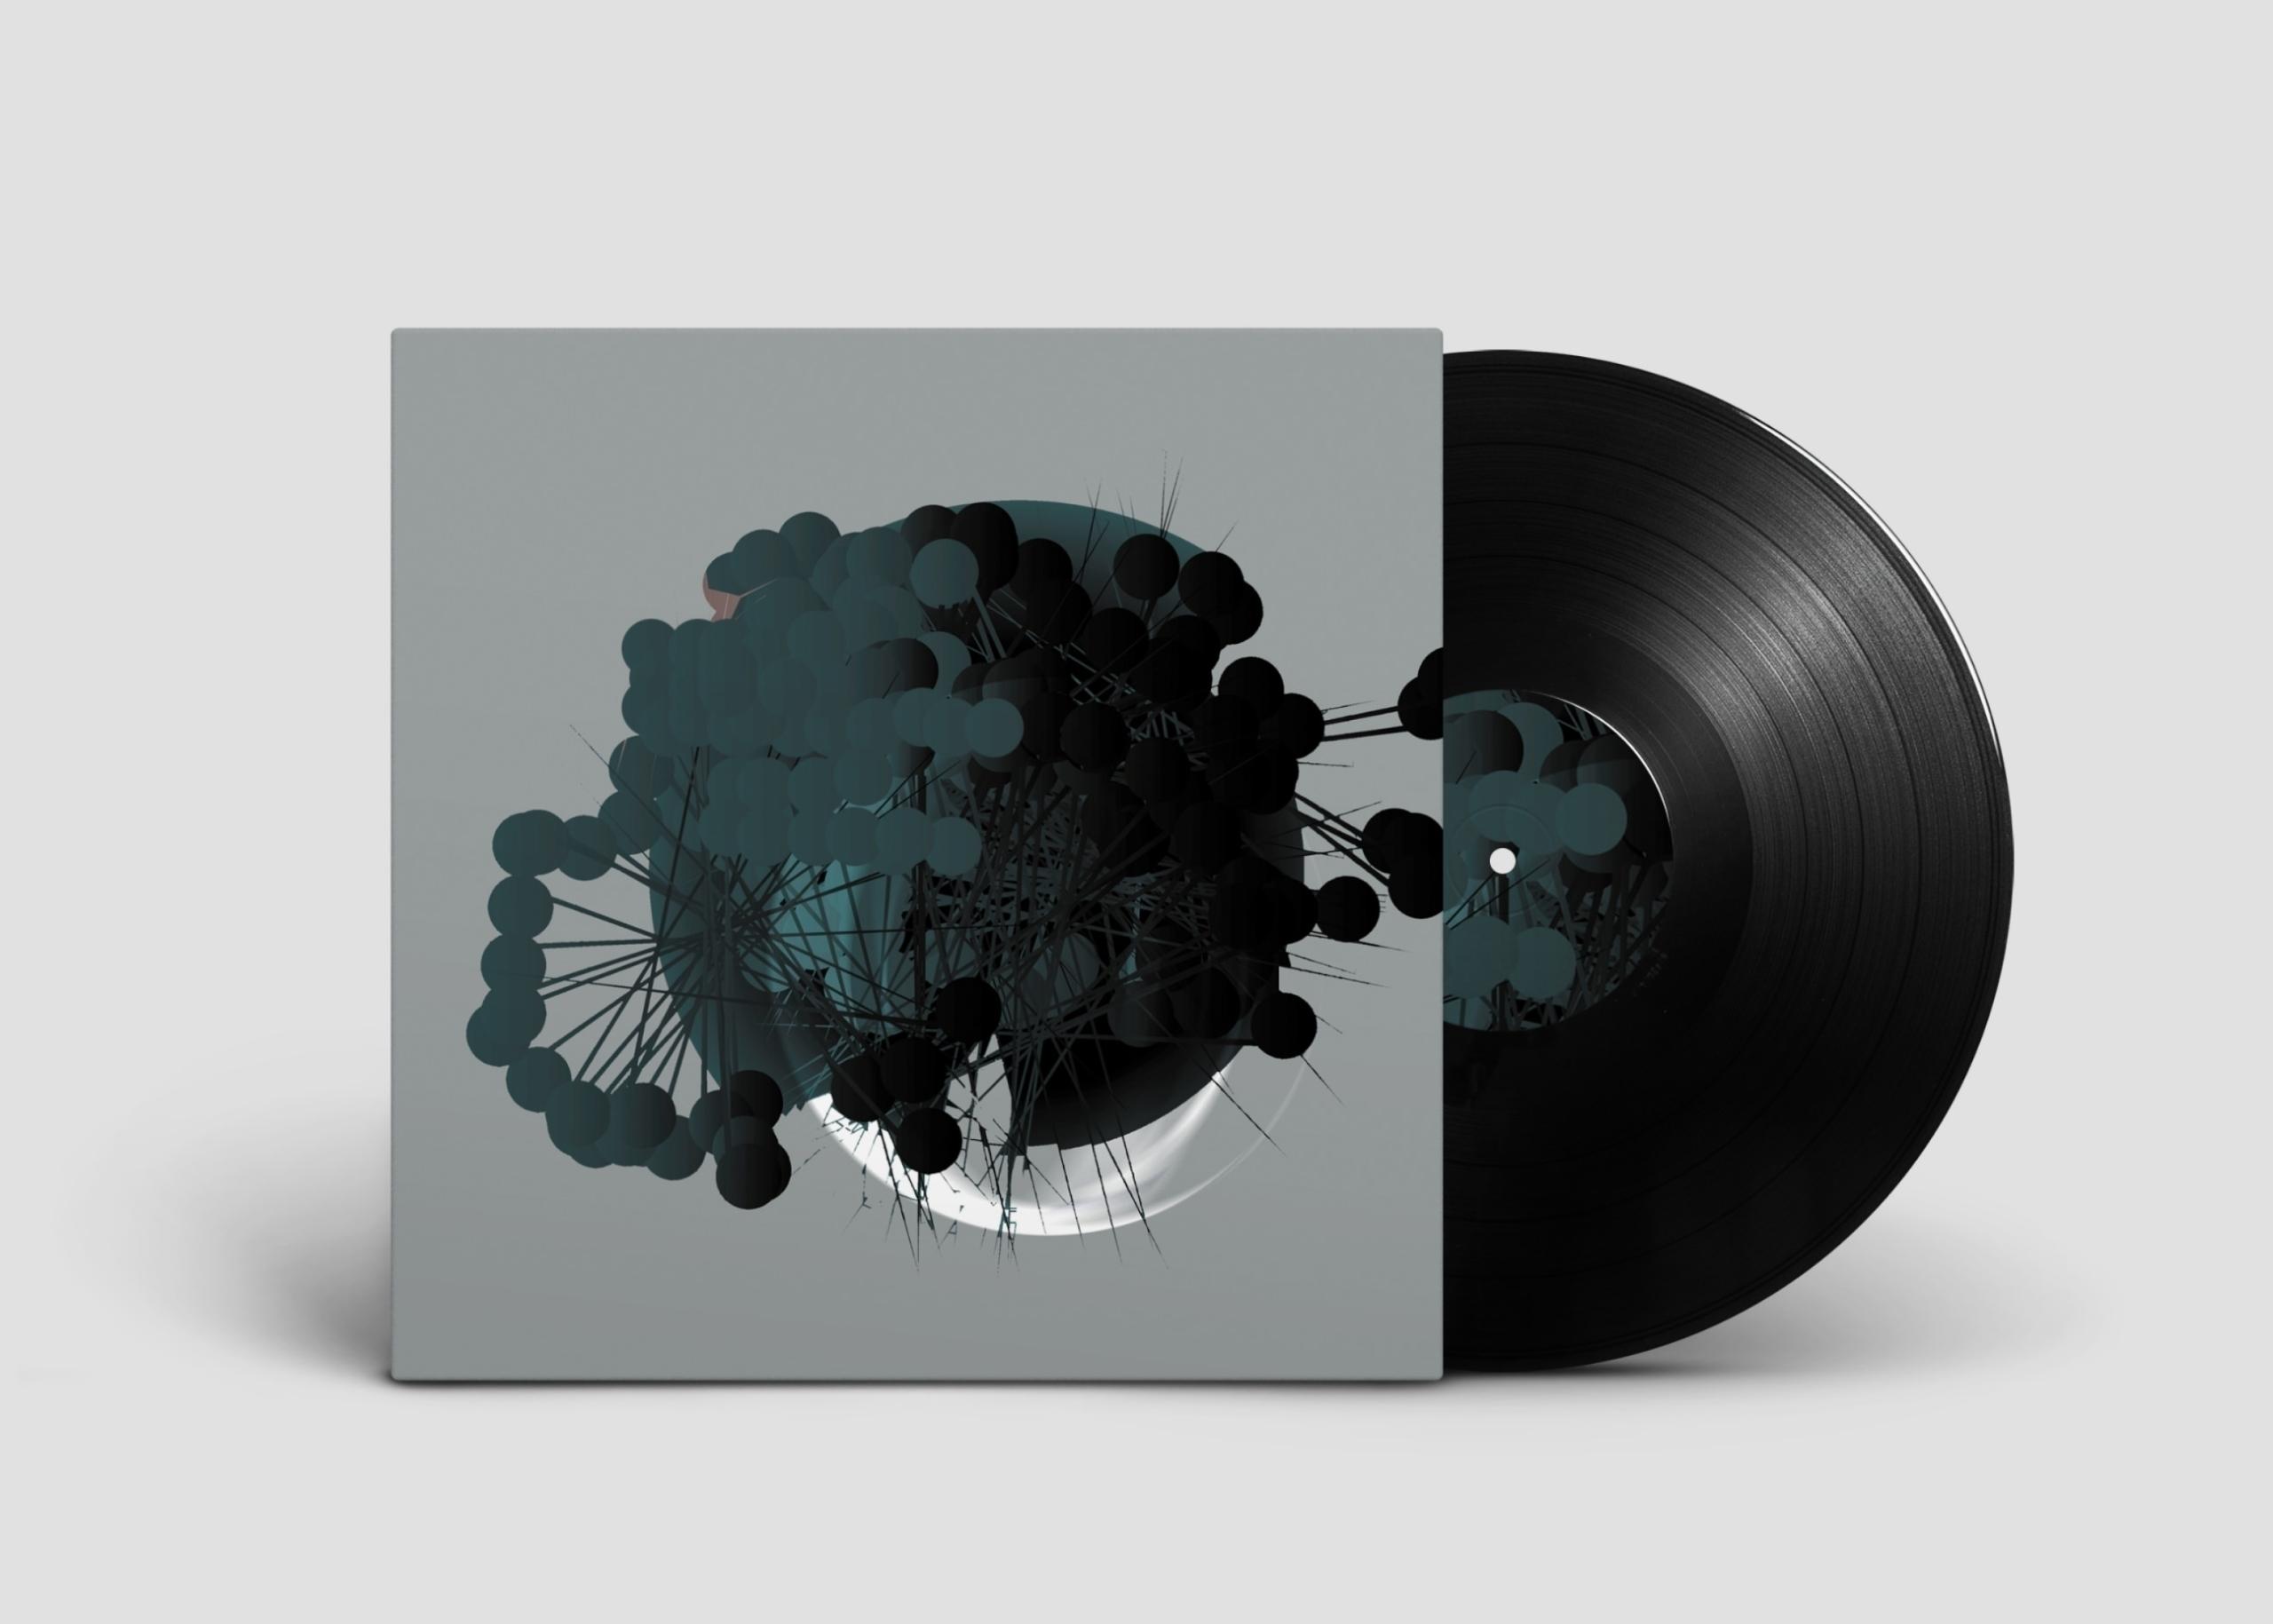 Harem/Friendship Records - Sound - marcomariosimonetti | ello